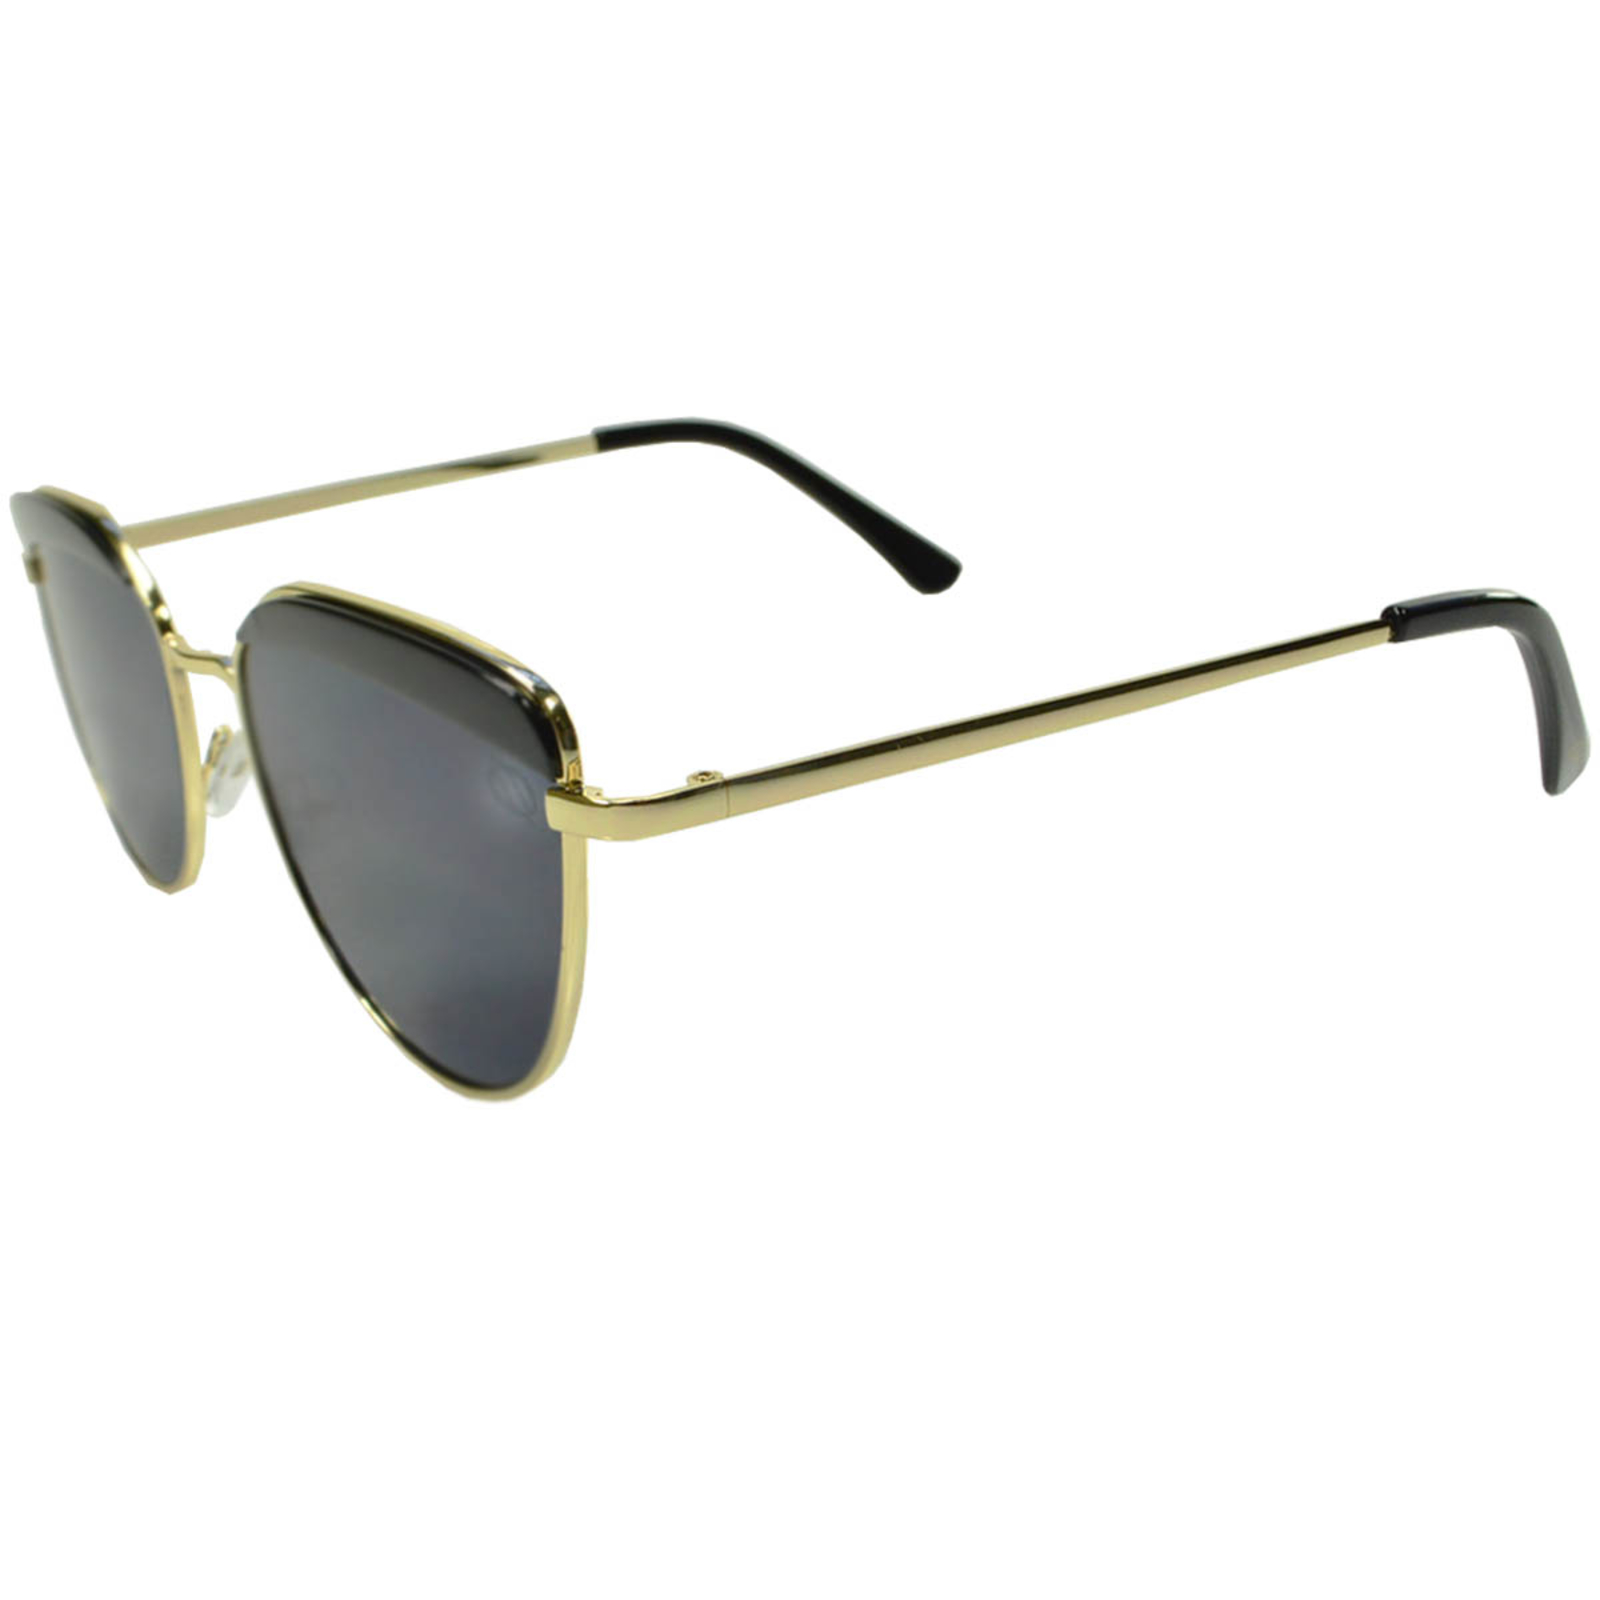 Óculos De Sol Tilit Feminino Metal Gateado - Dourado/Preto